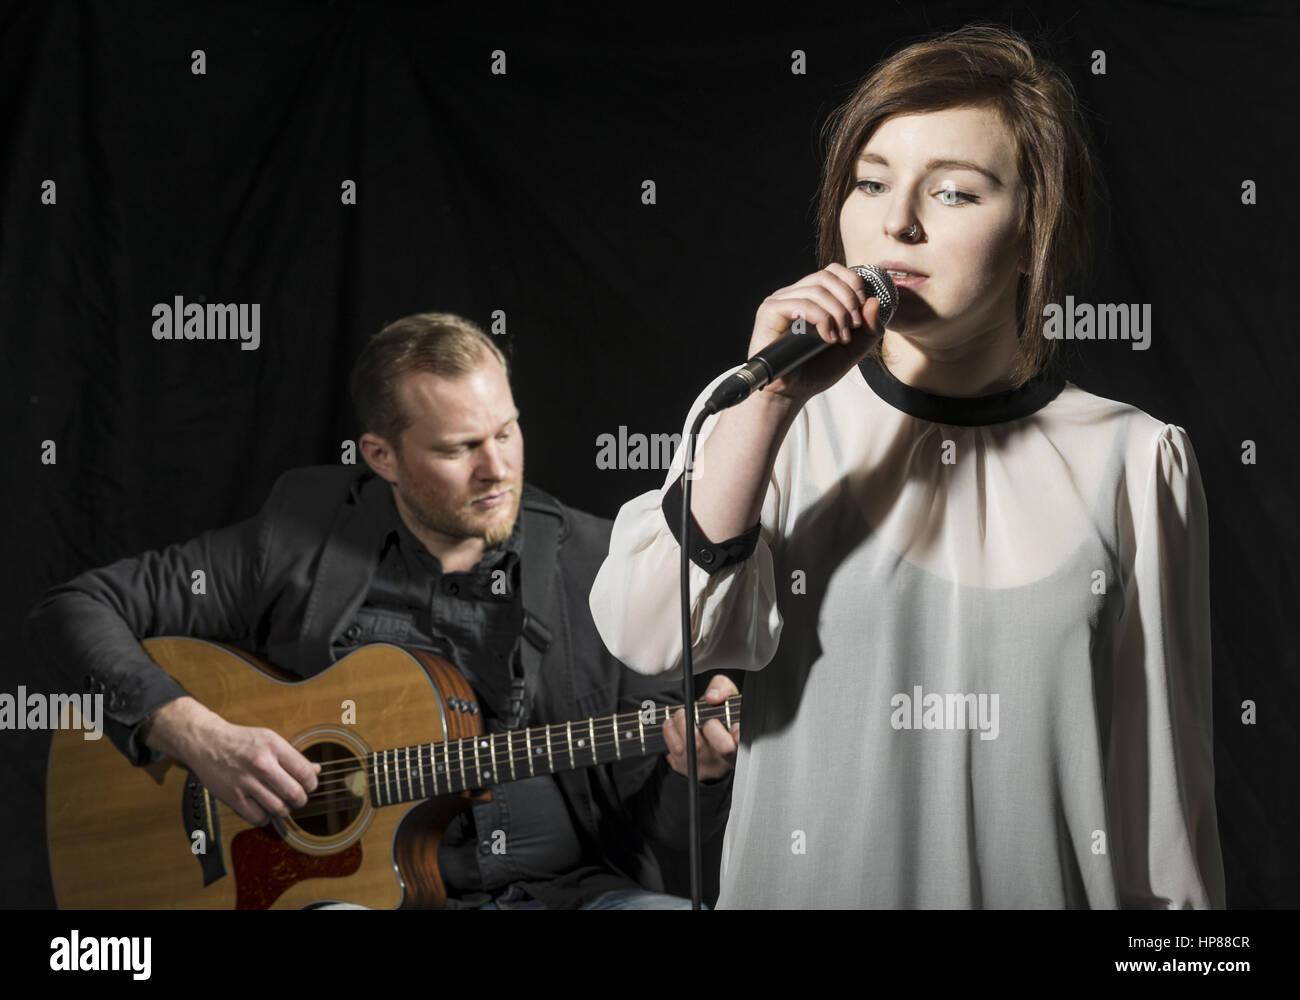 Musiker Mit Gitarre, Saengerin Mit Mikrofon (Model-Release) Stockbild